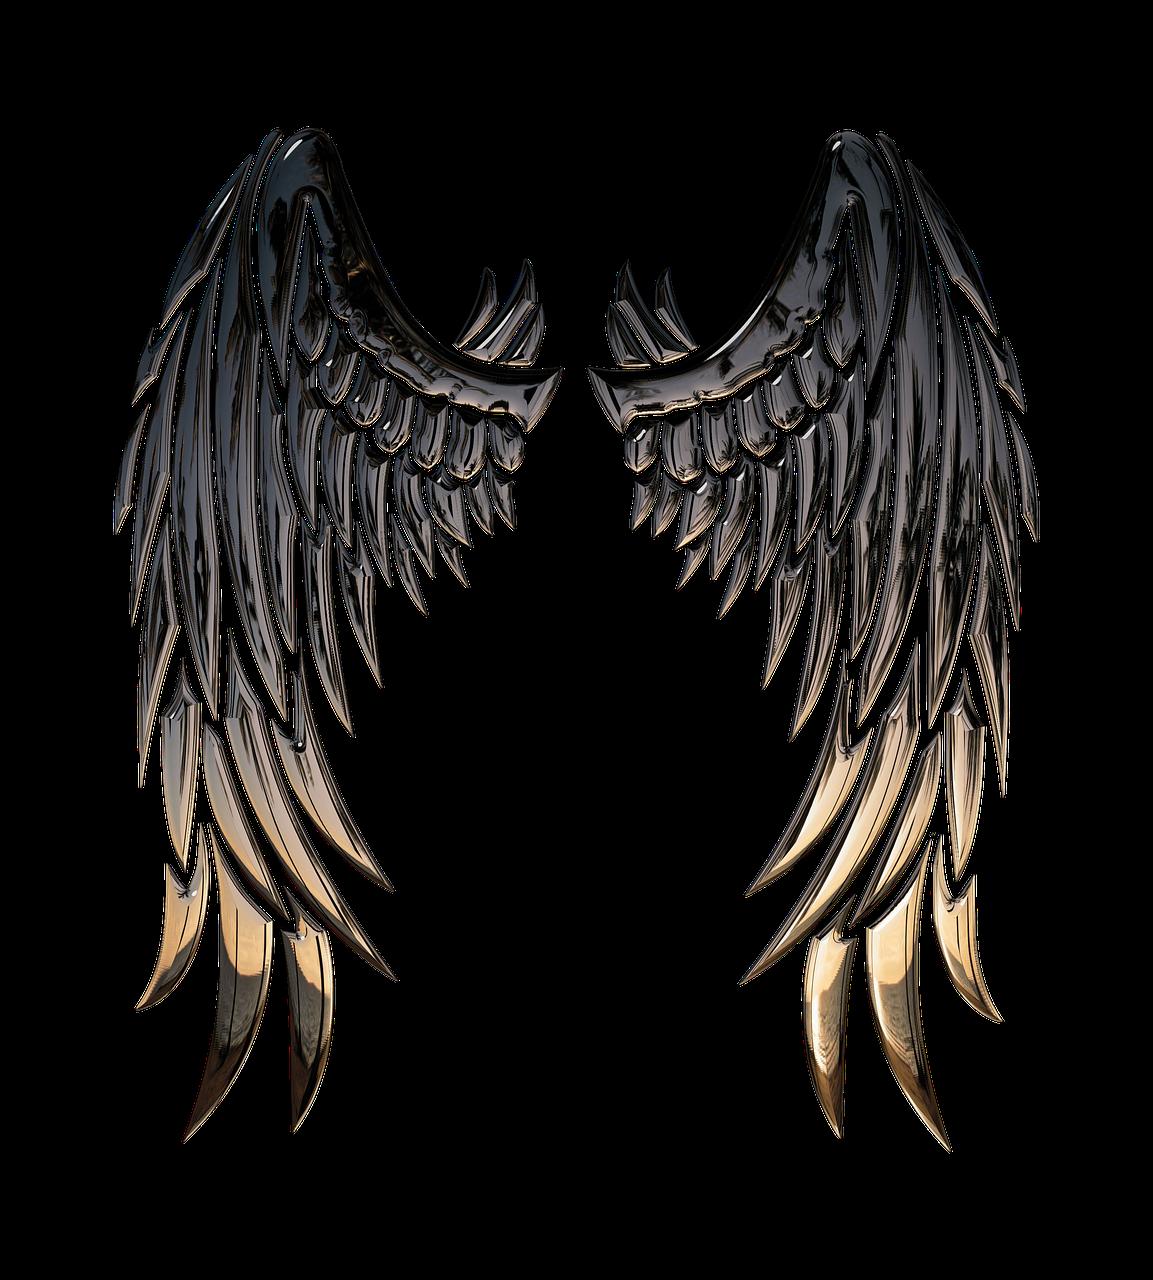 angel-1740459-1280-1